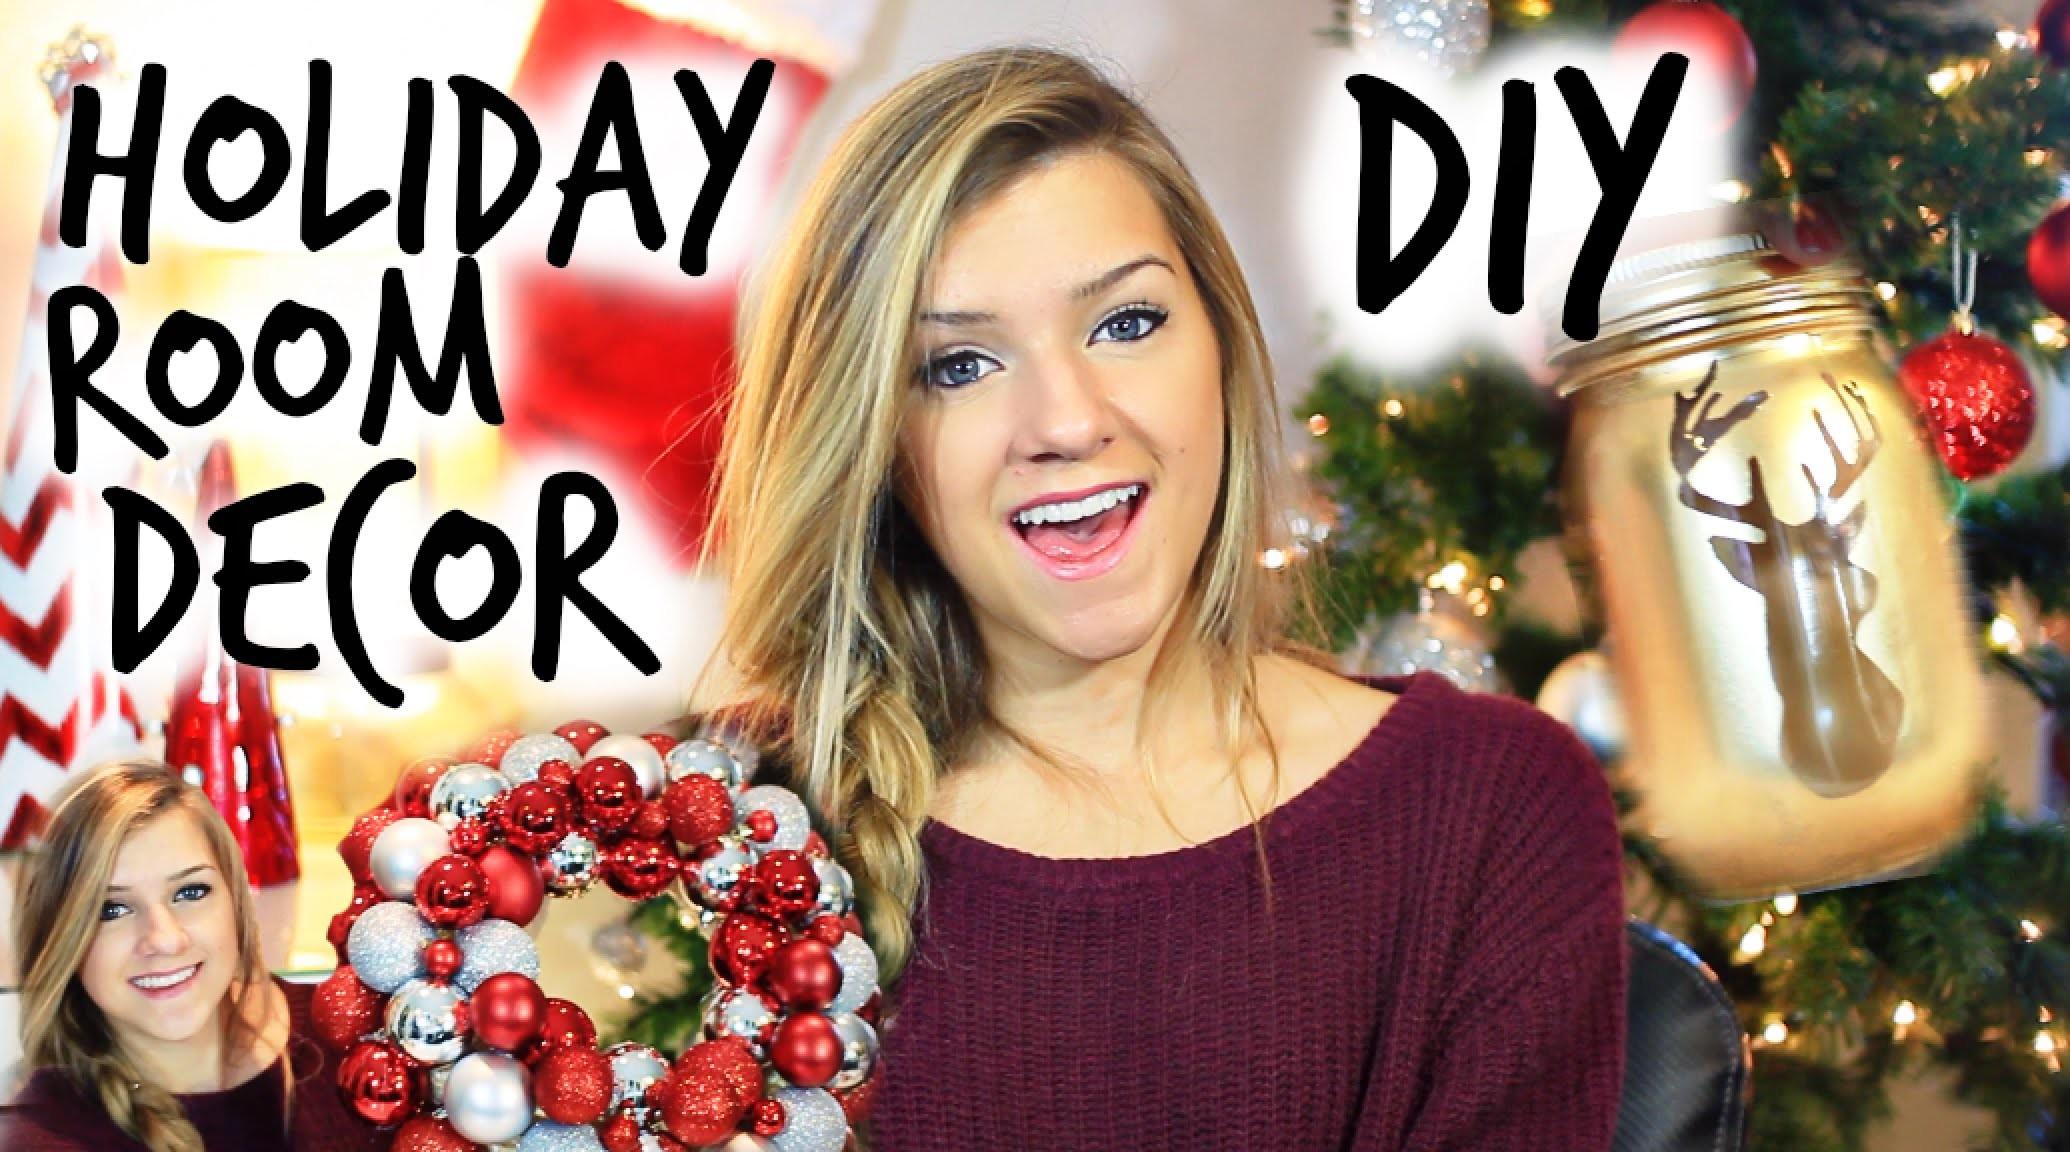 DIY Christmas Room Decorations!